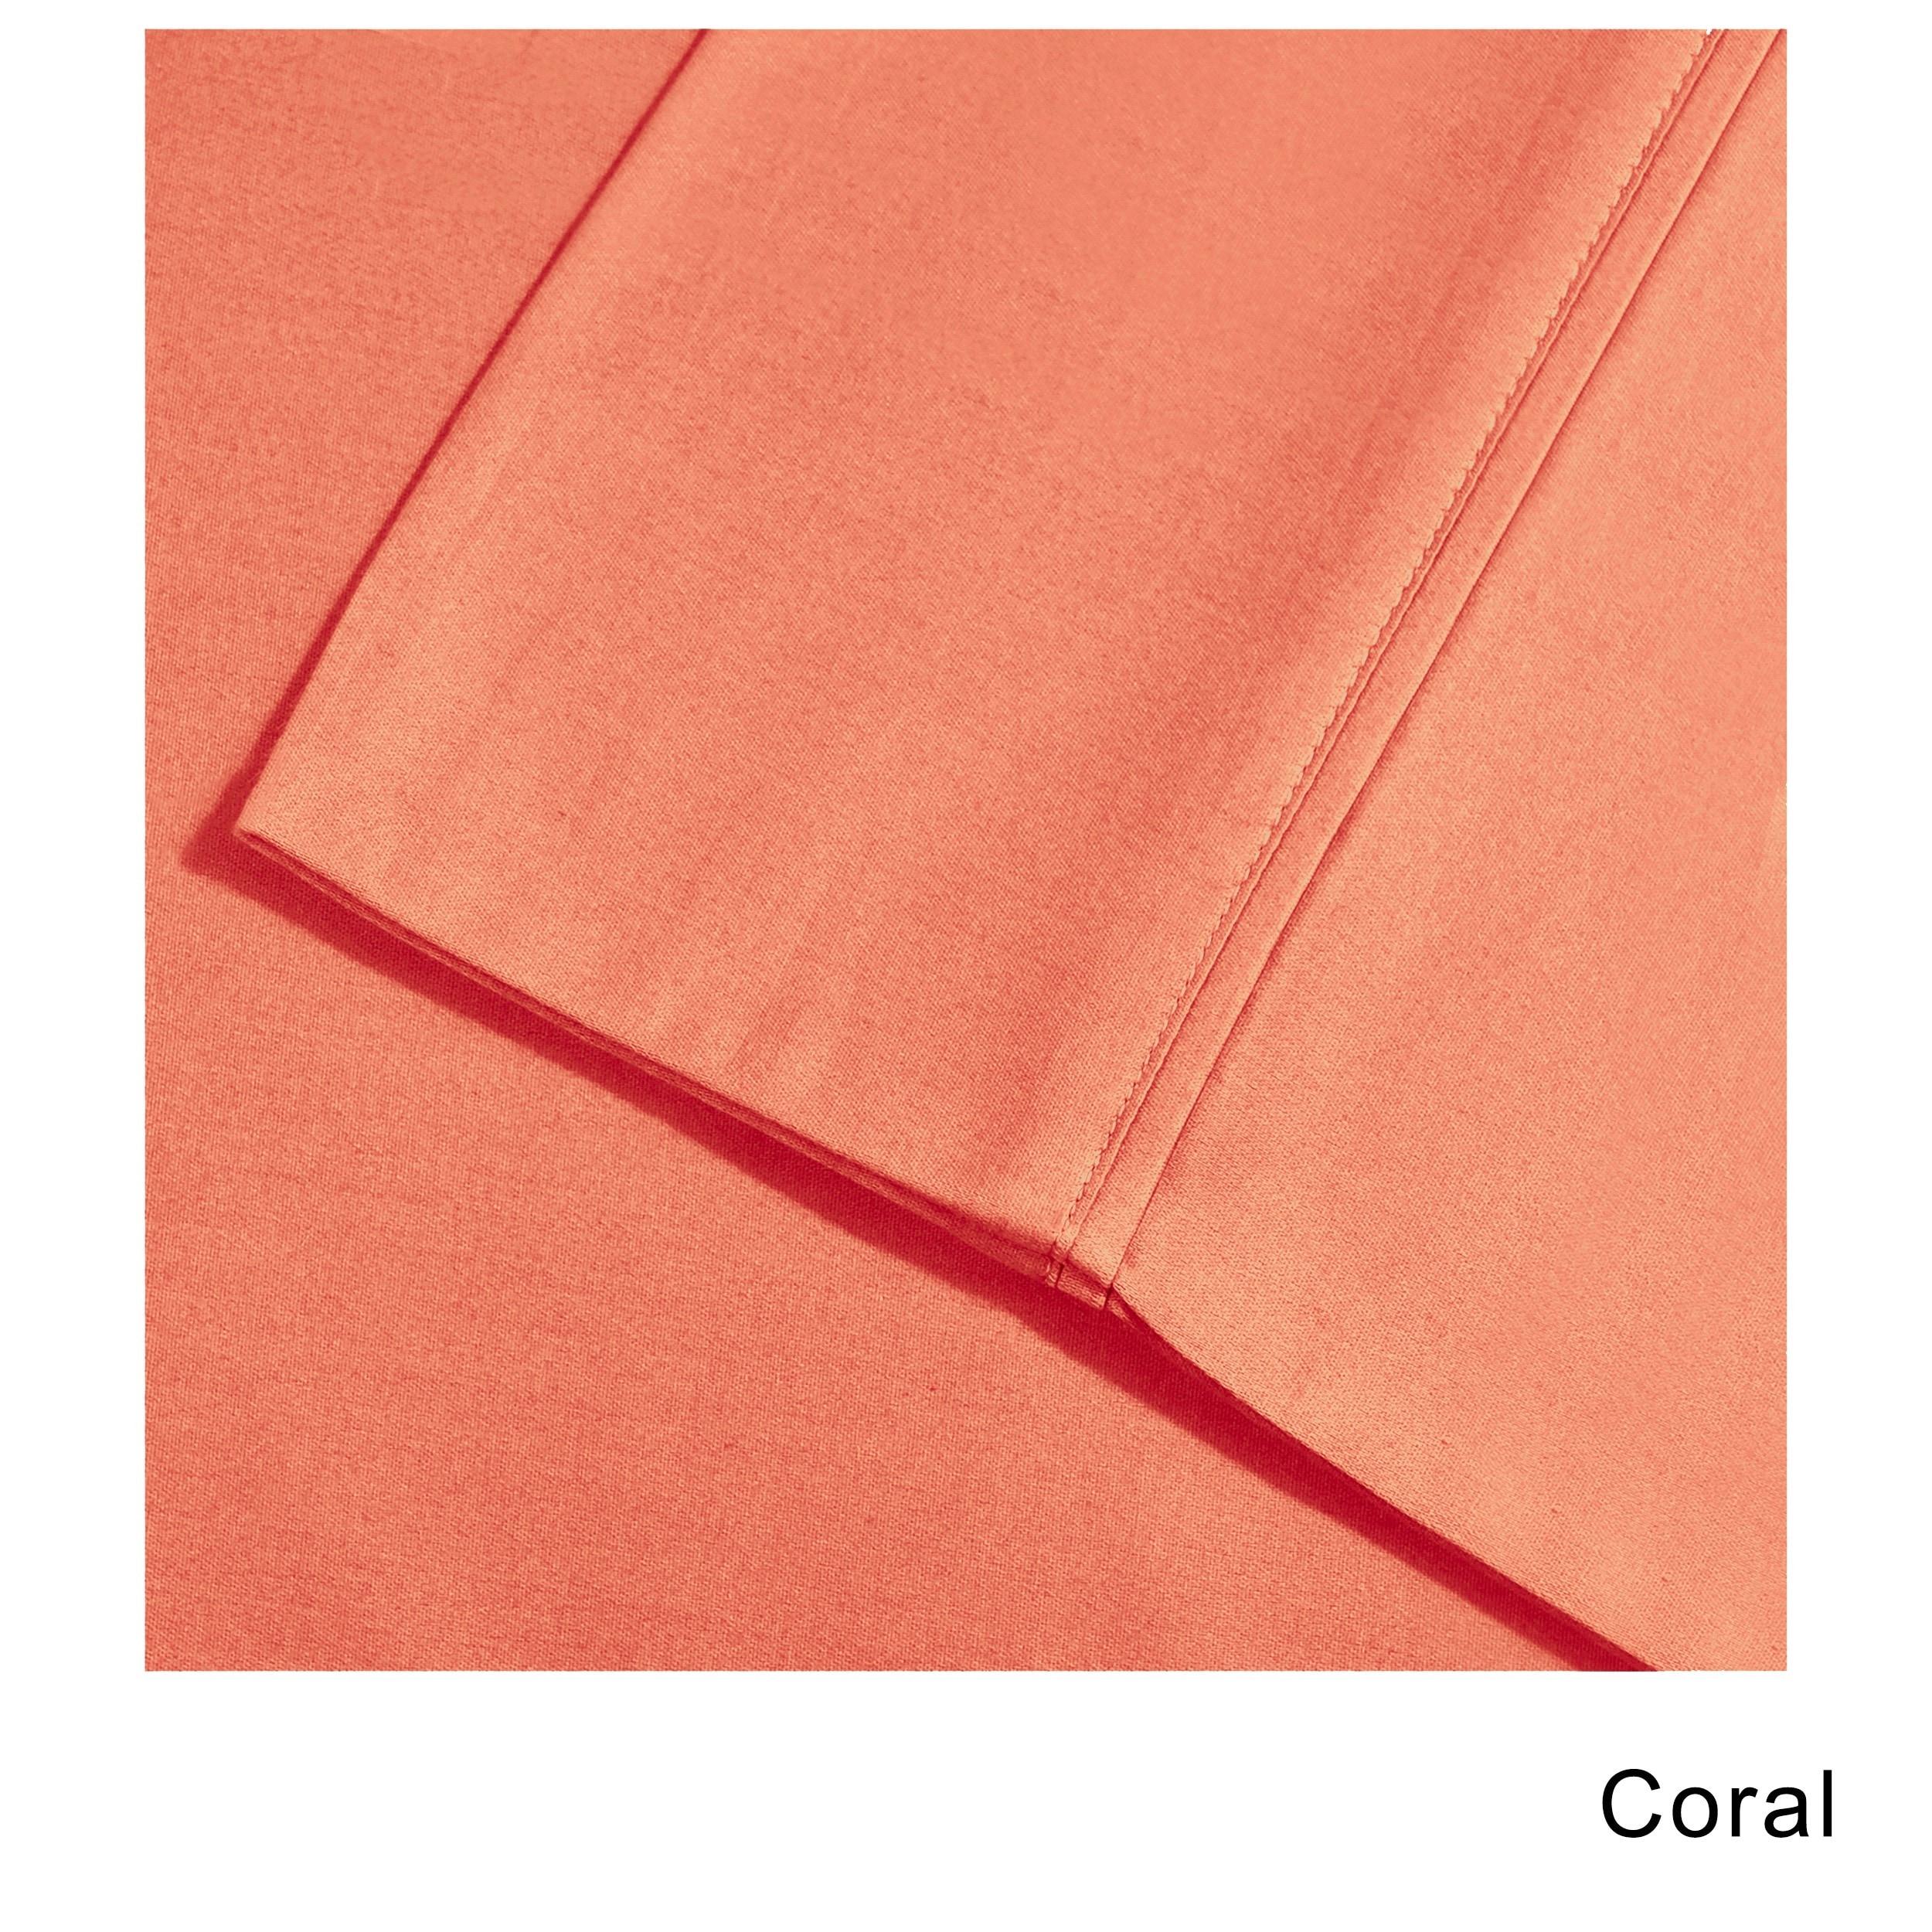 square conran coral pillow sophie linen collection scallop bed pillowcase web cases scalloped